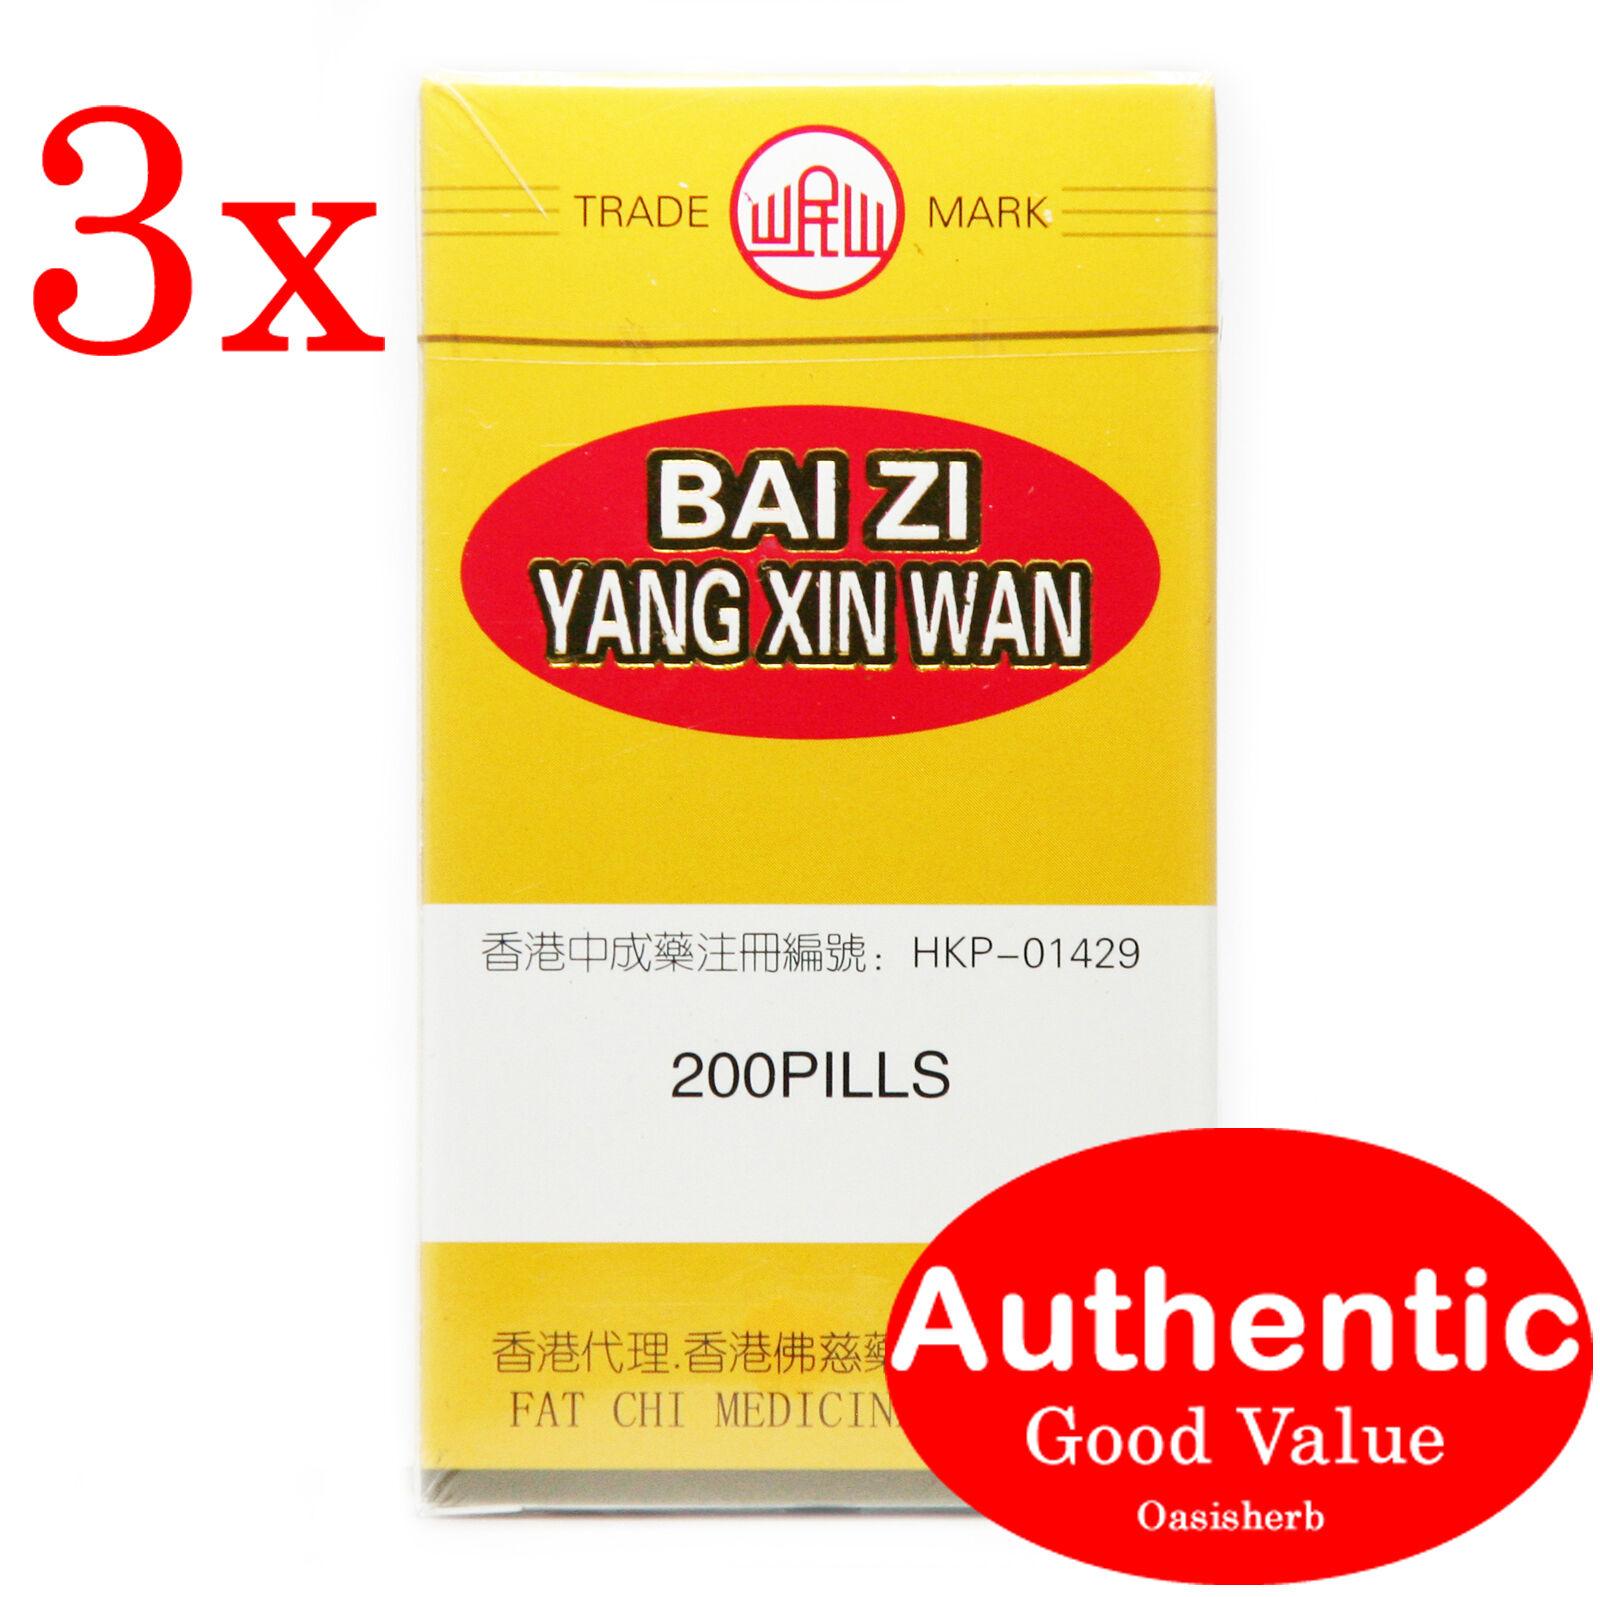 3X Min Shan Brand Bai Zi Yang Xin Wan for sleeplessness and calming mind (New!) 1